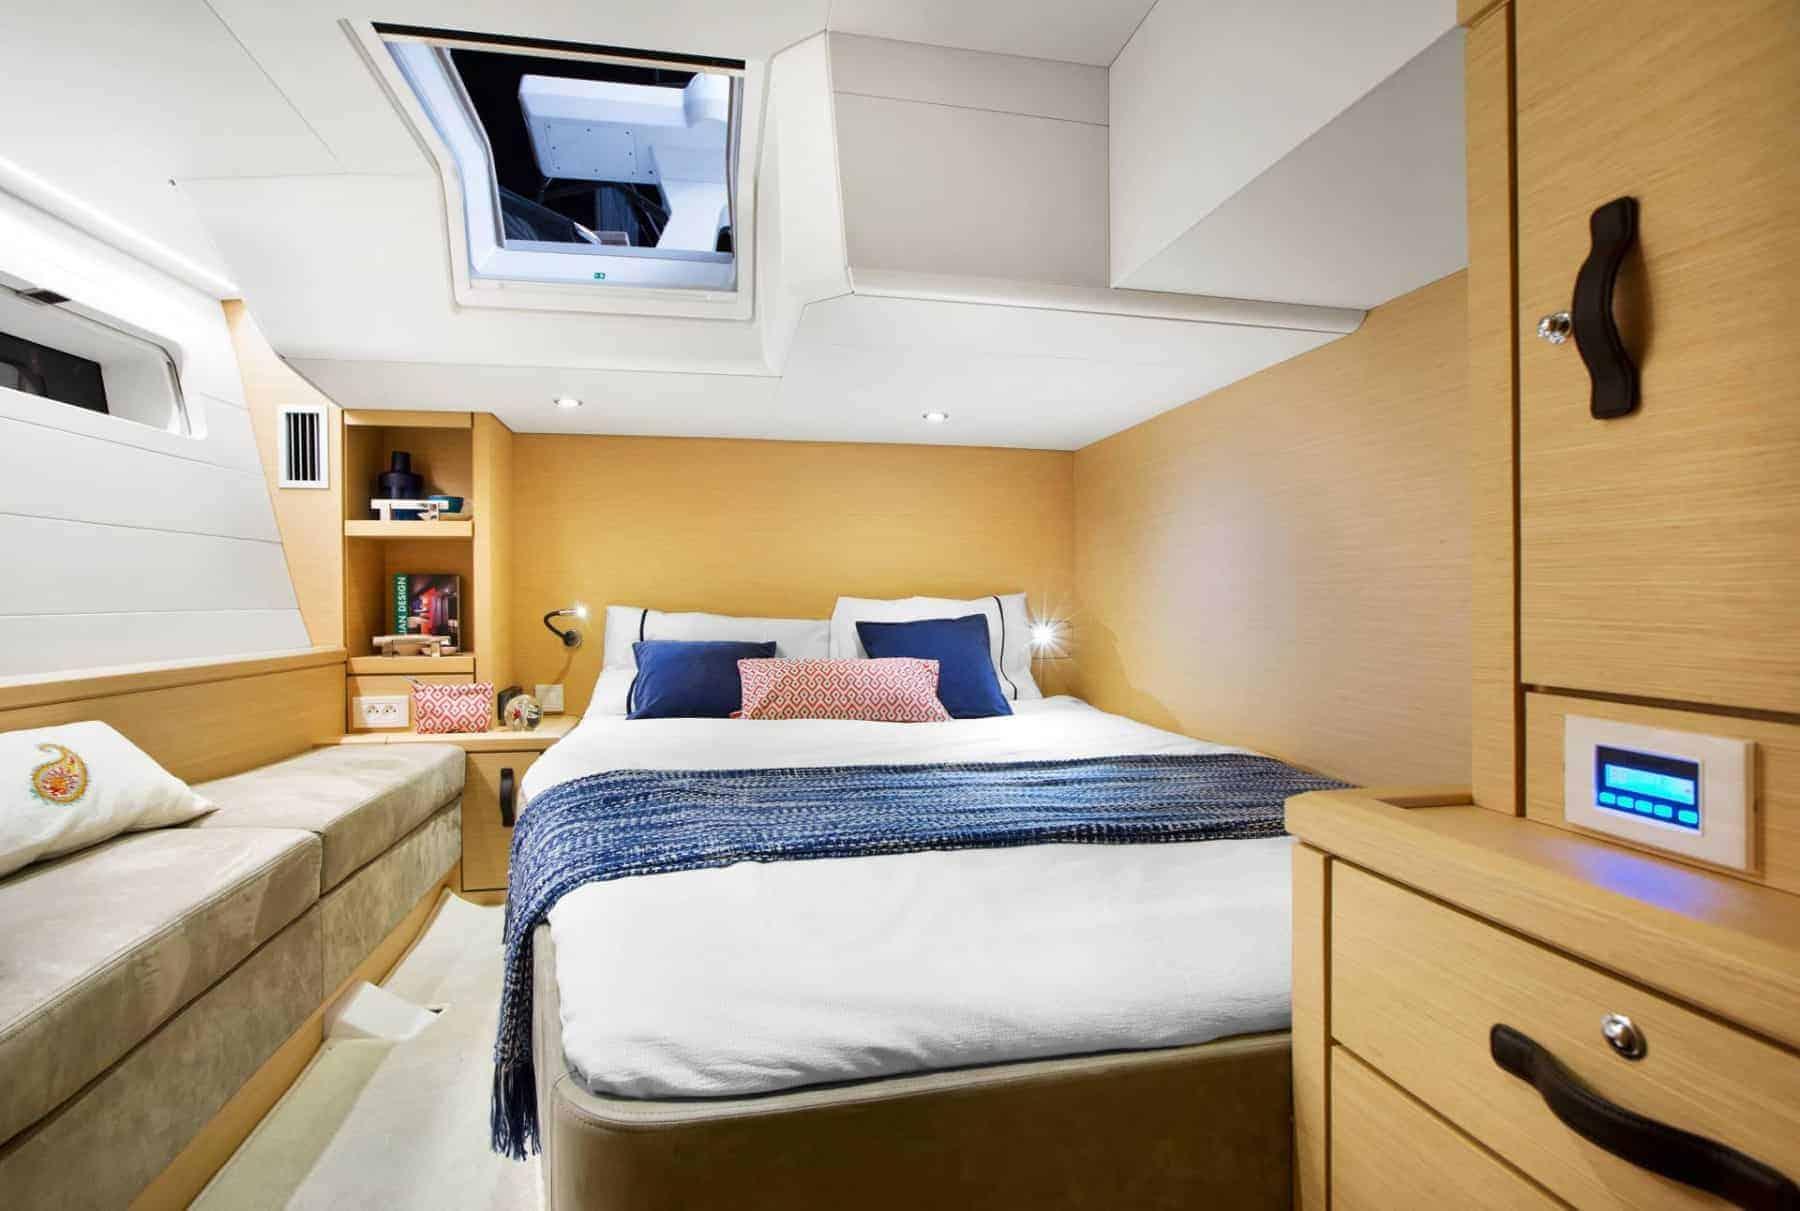 Jeanneau-64-interior-cabin-7-charter-ownership-yacht